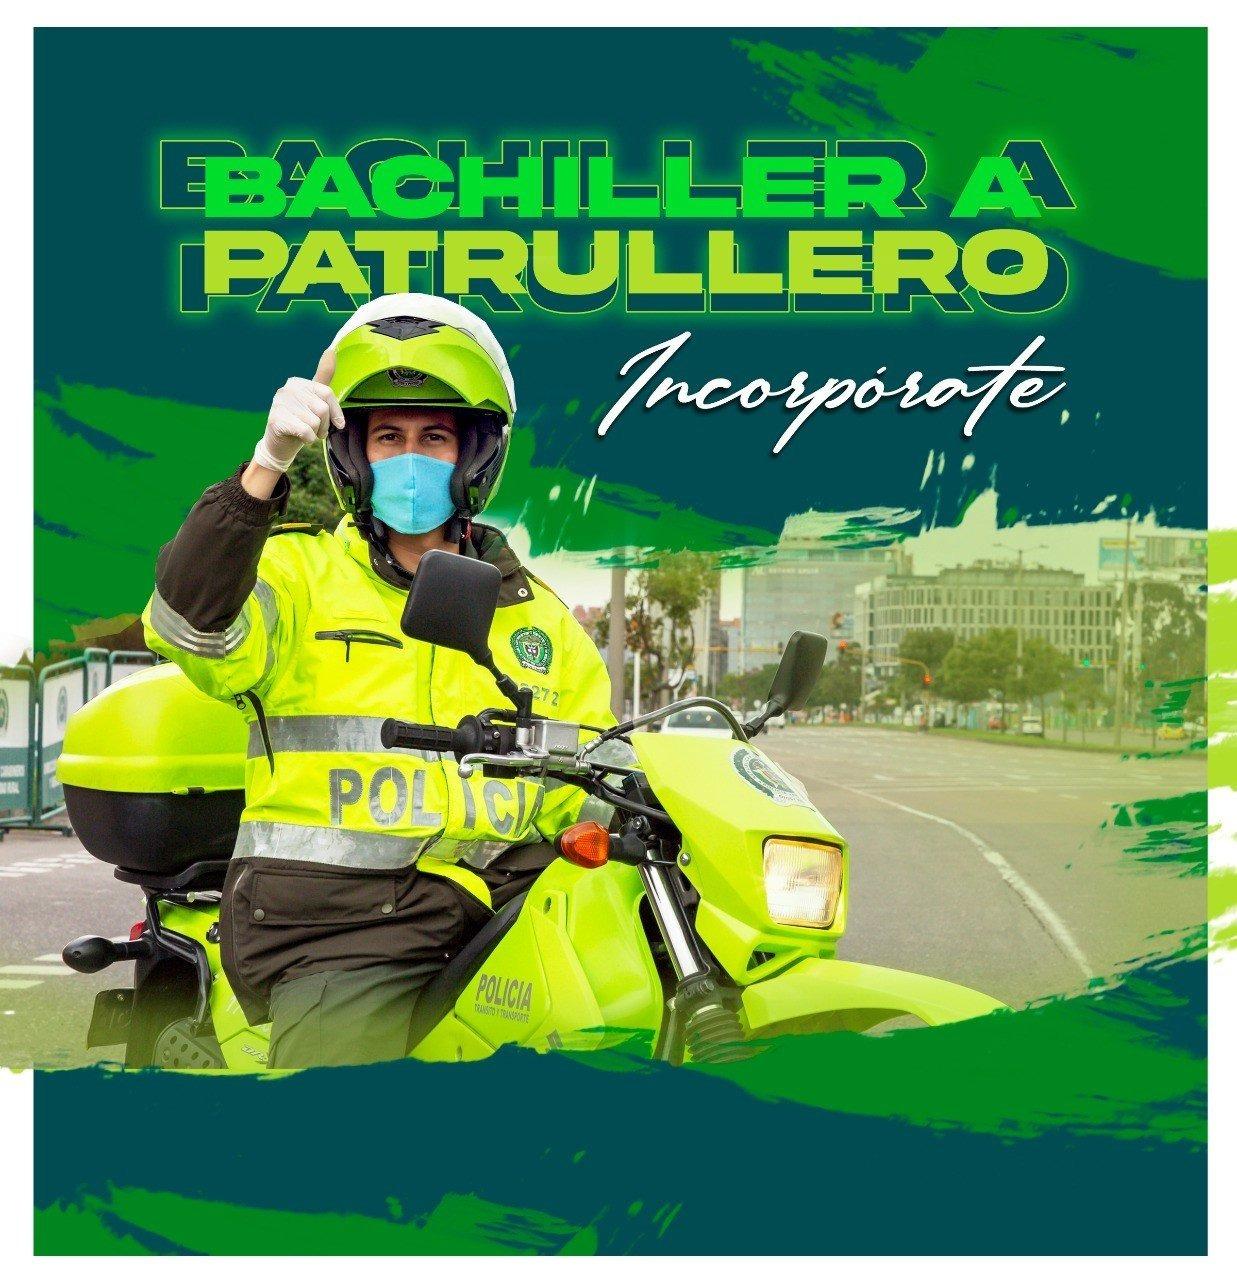 Abierta la convocatoria de bachiller a patrullero  | foto | EL FRENTE